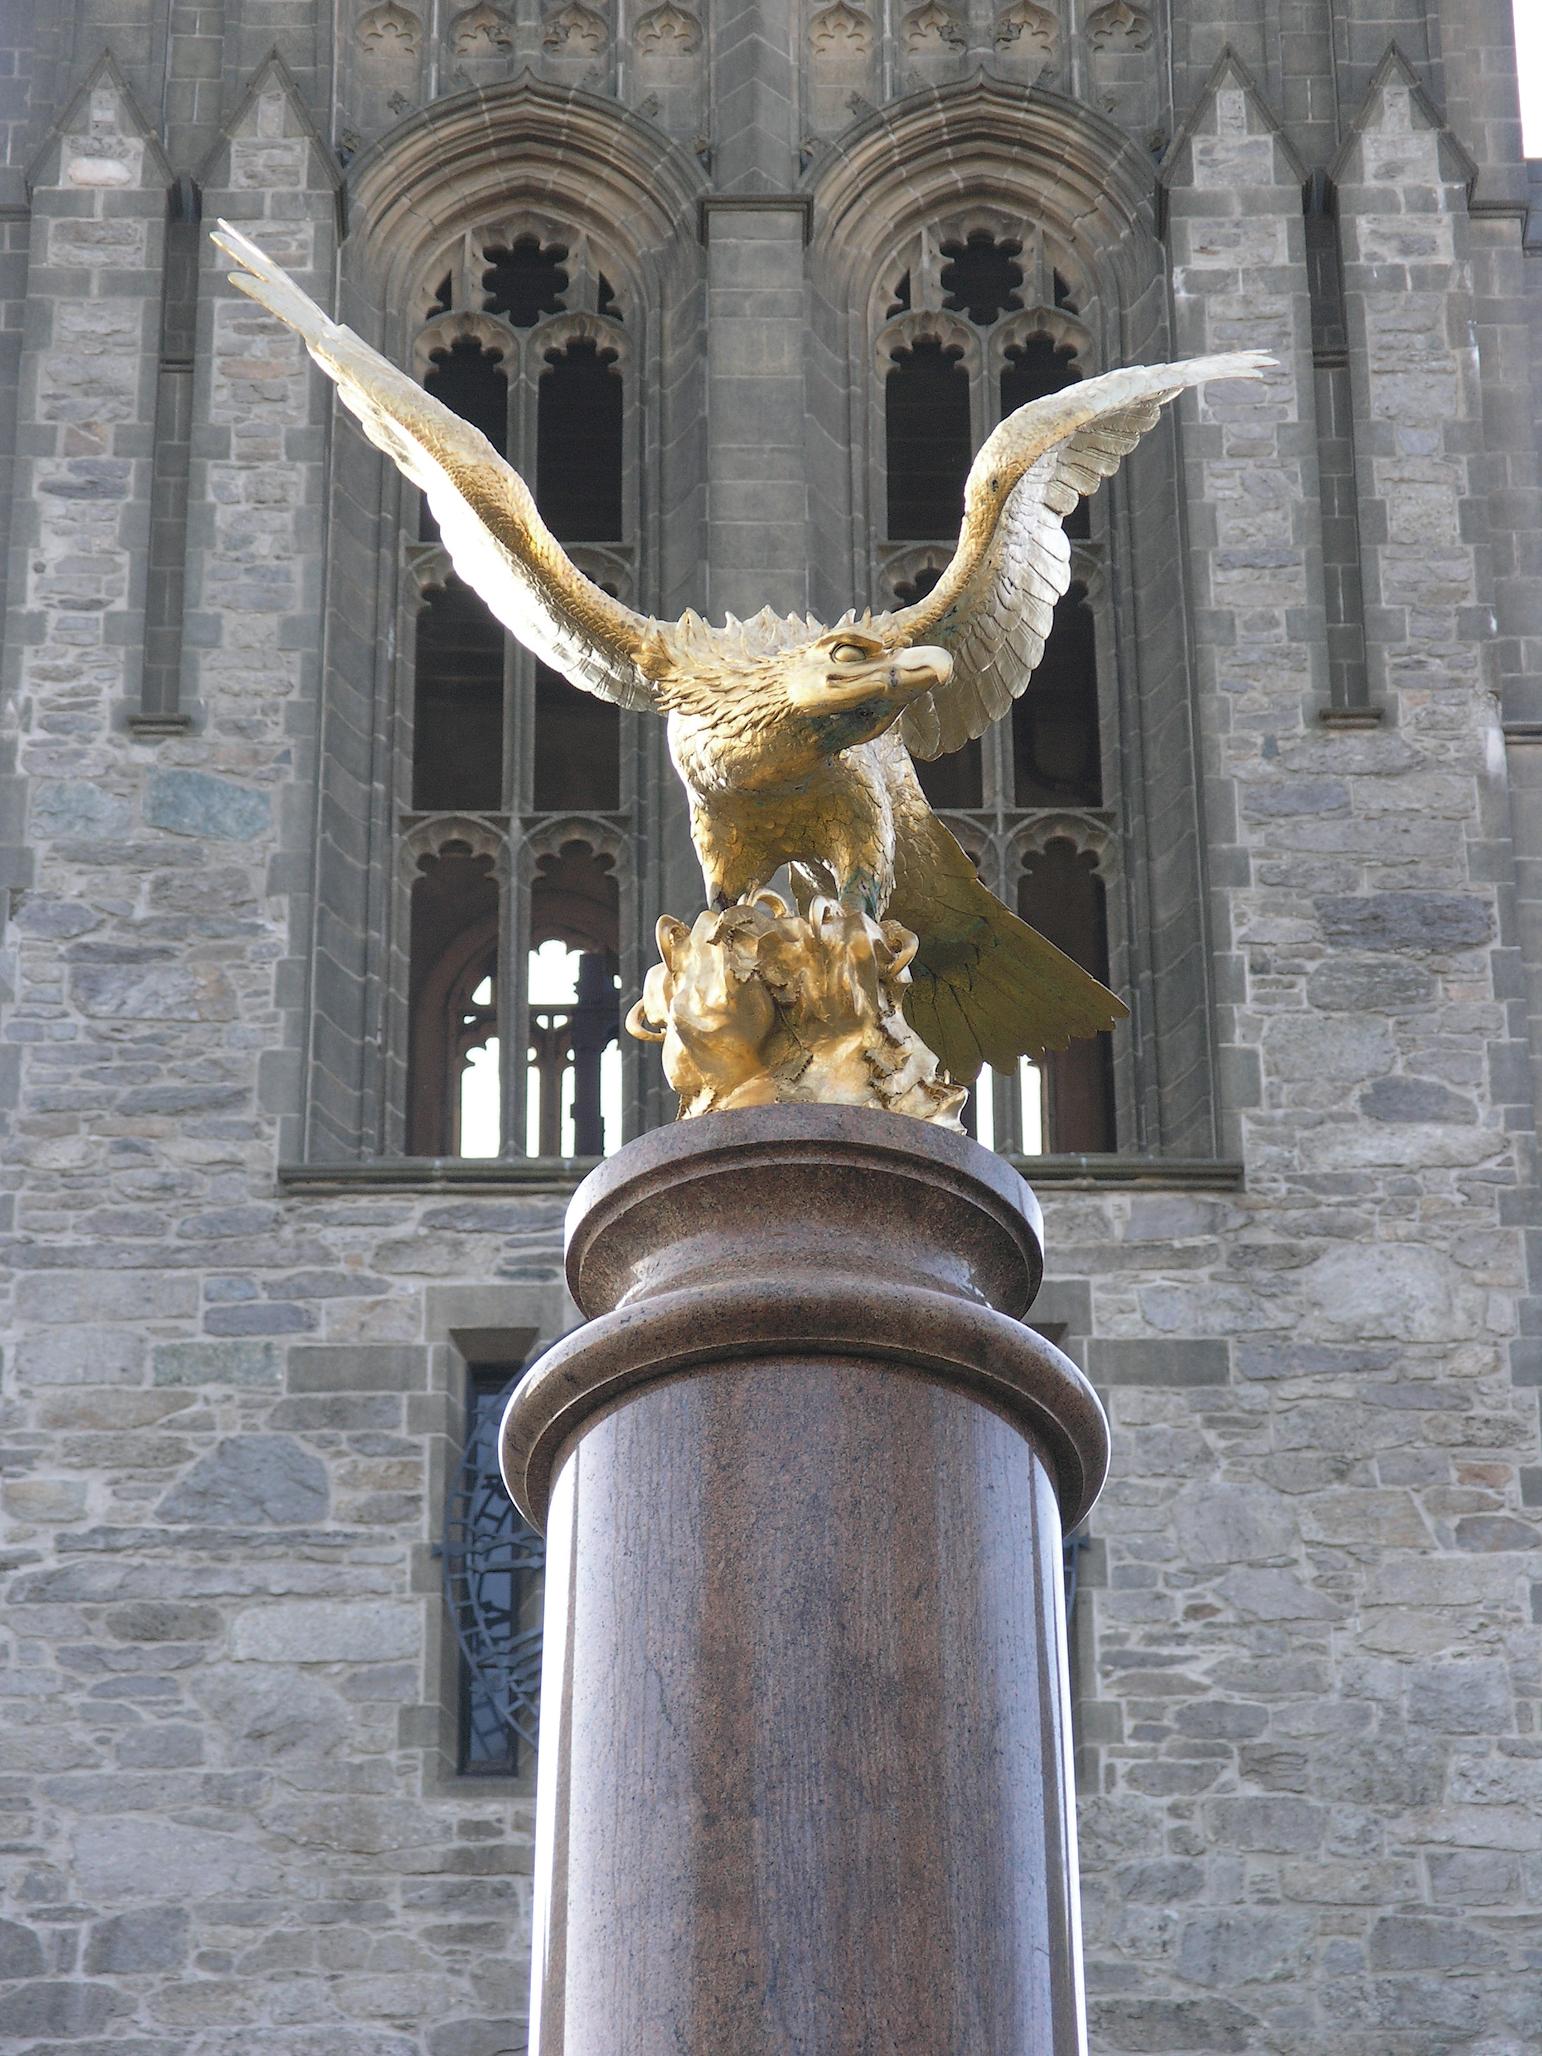 Photograph showing golden eagle on marble pedestal